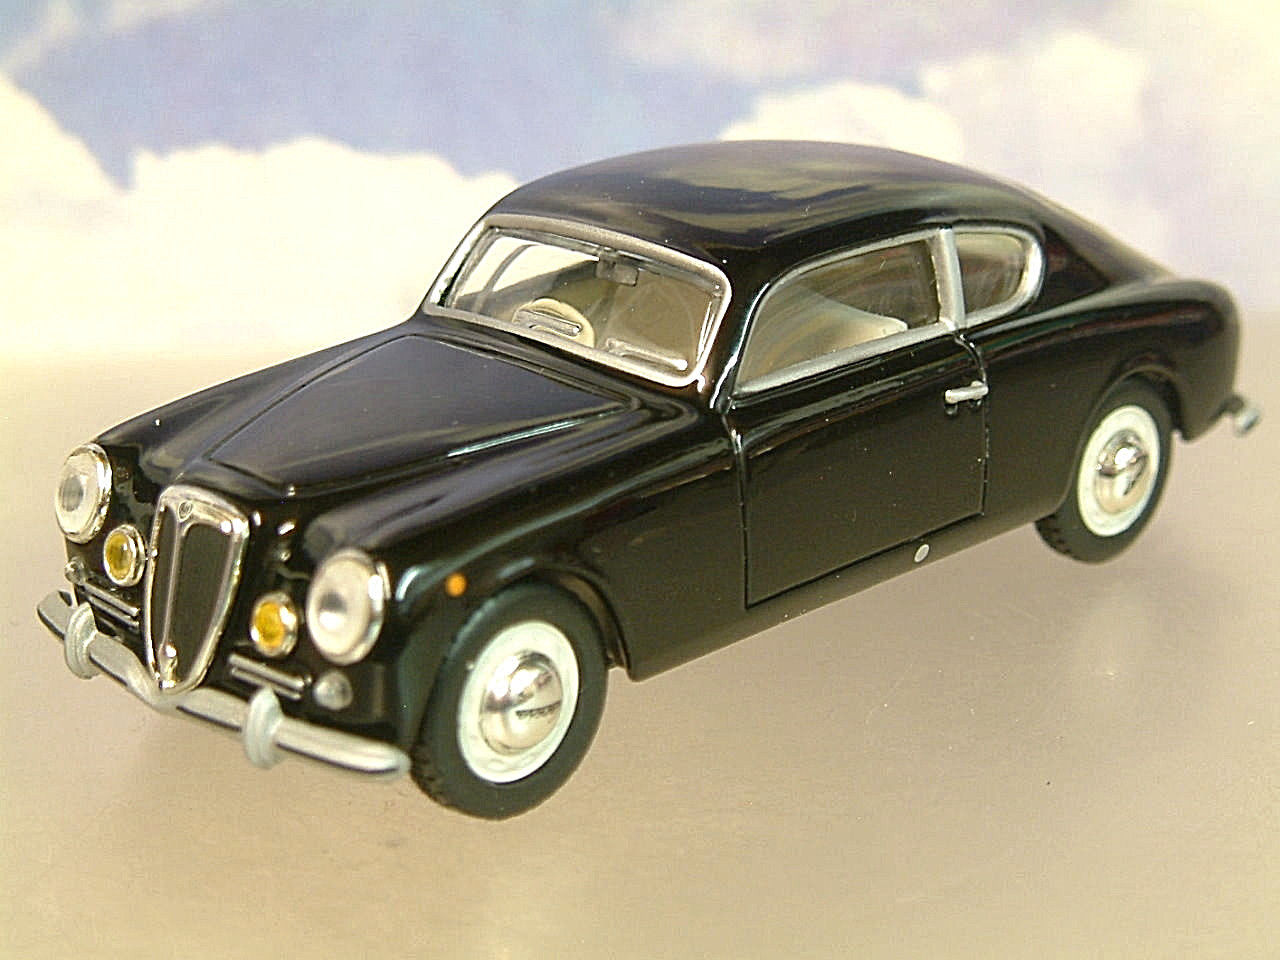 Lot 10359 - V Brand New 1/43 Diecast 1951 Lancia Aurelia Gran Turismo GT B20 - eBay Price £14.95